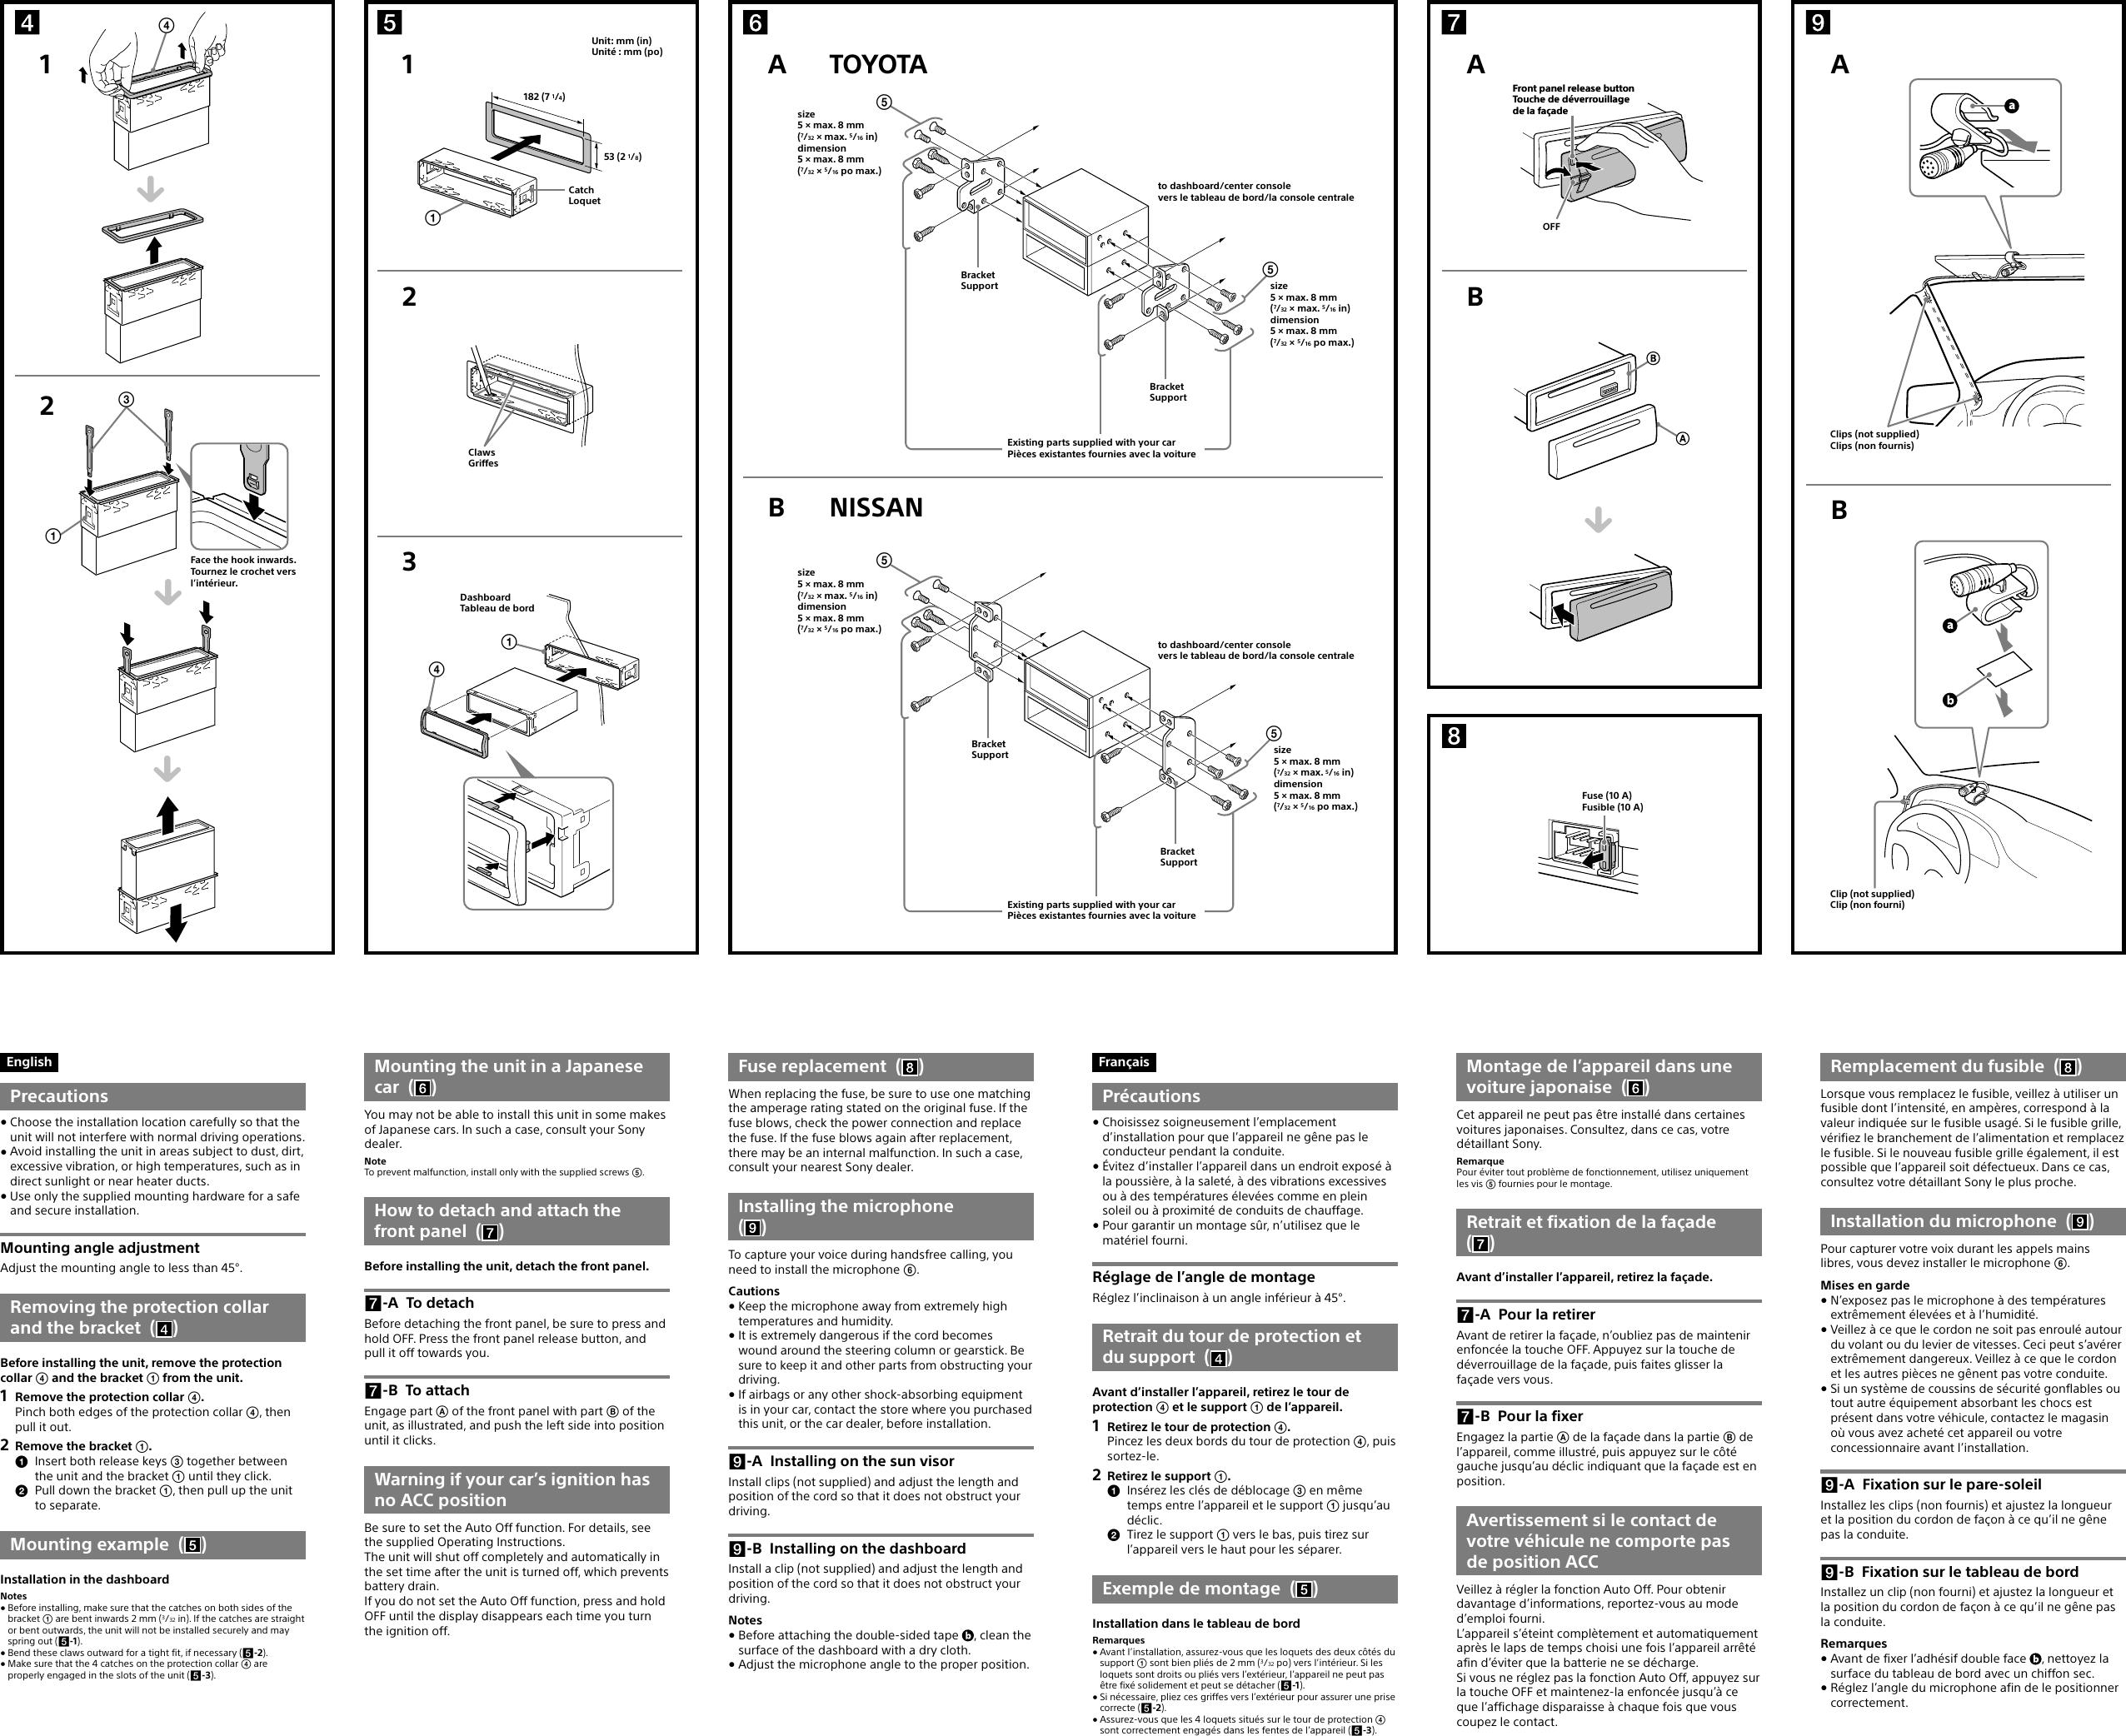 Sony Mex N4000bt Wiring Harness Diagram Explained Diagrams Cdxgt710hd N5000bt N4100bt Mp40 Parts